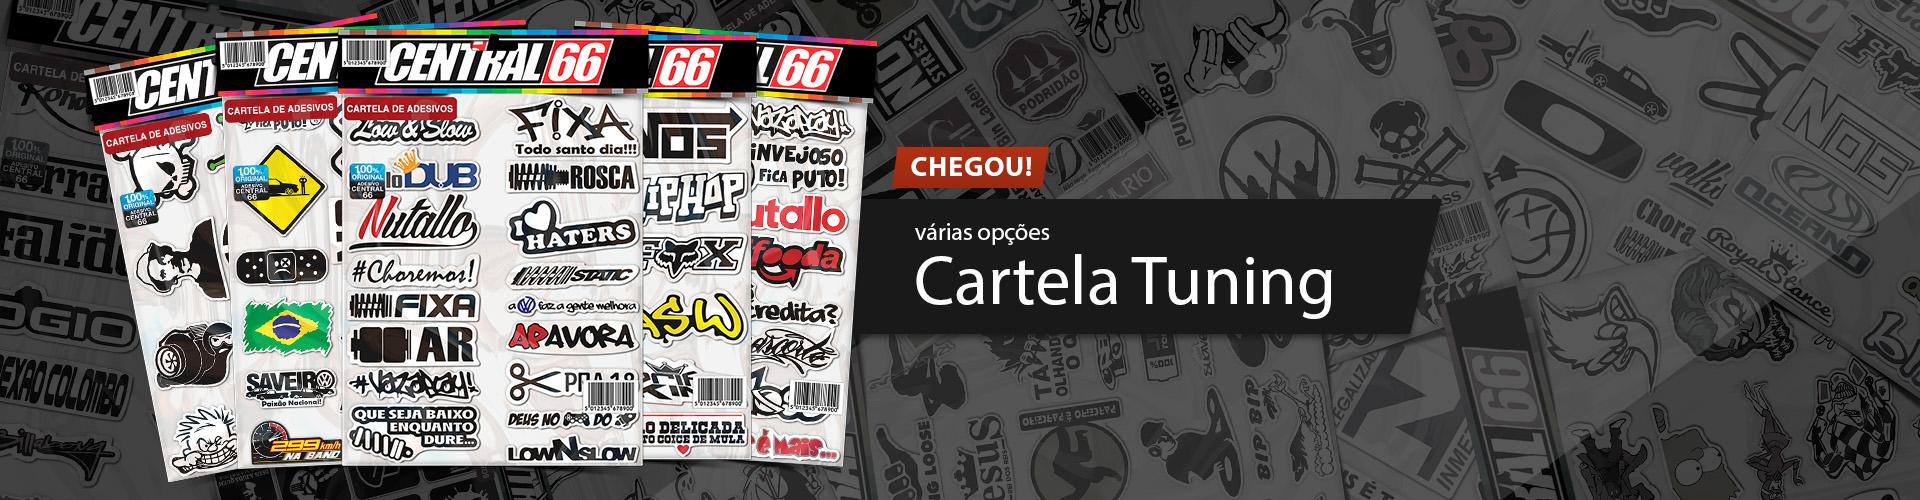 Cartela Tuning